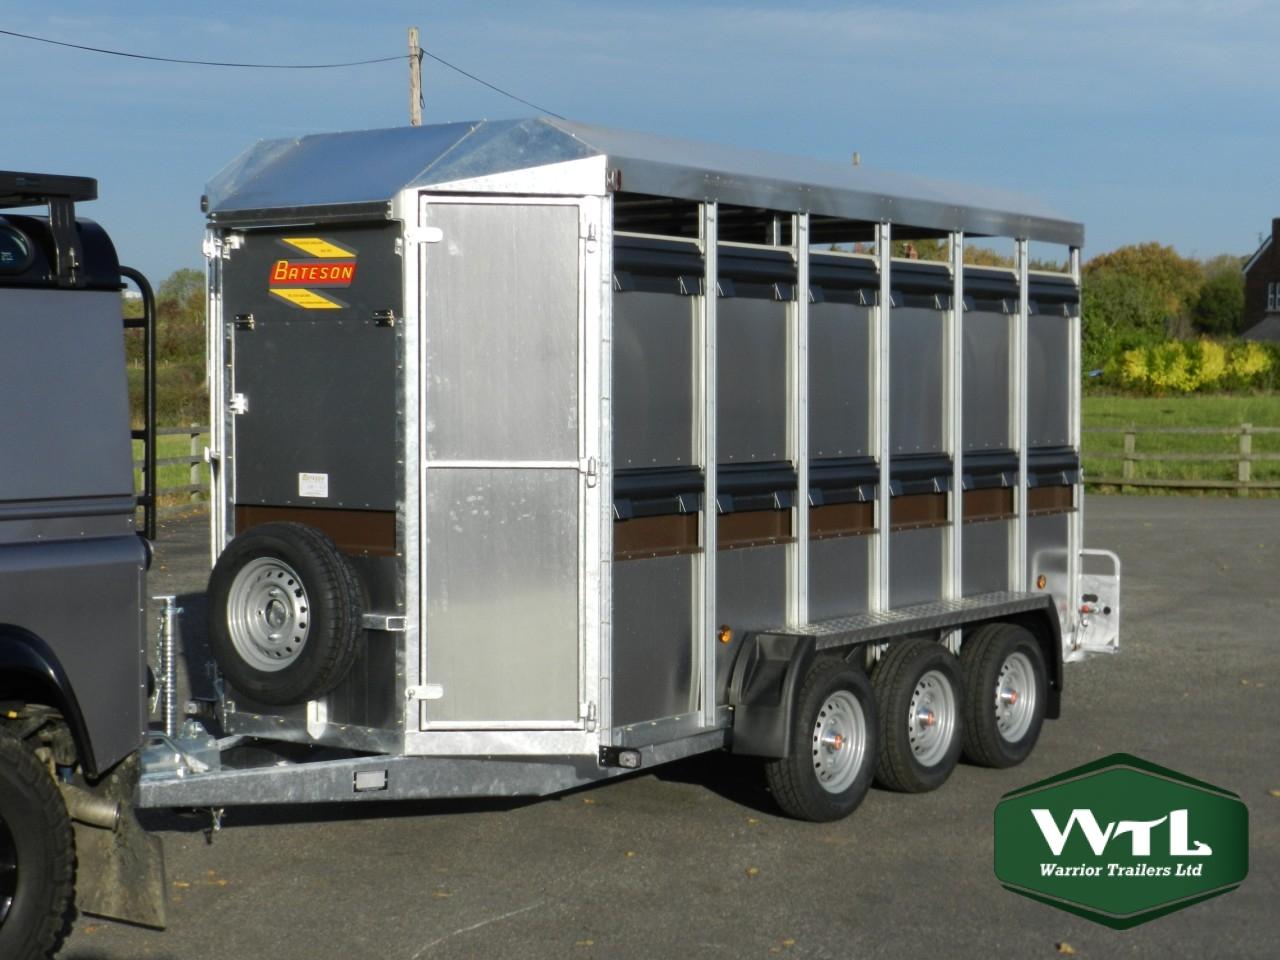 Warrior Trailers Ltd Trailer Parts Service Hire Sale Uk Hgv Wiring Diagram Ireland Delivery